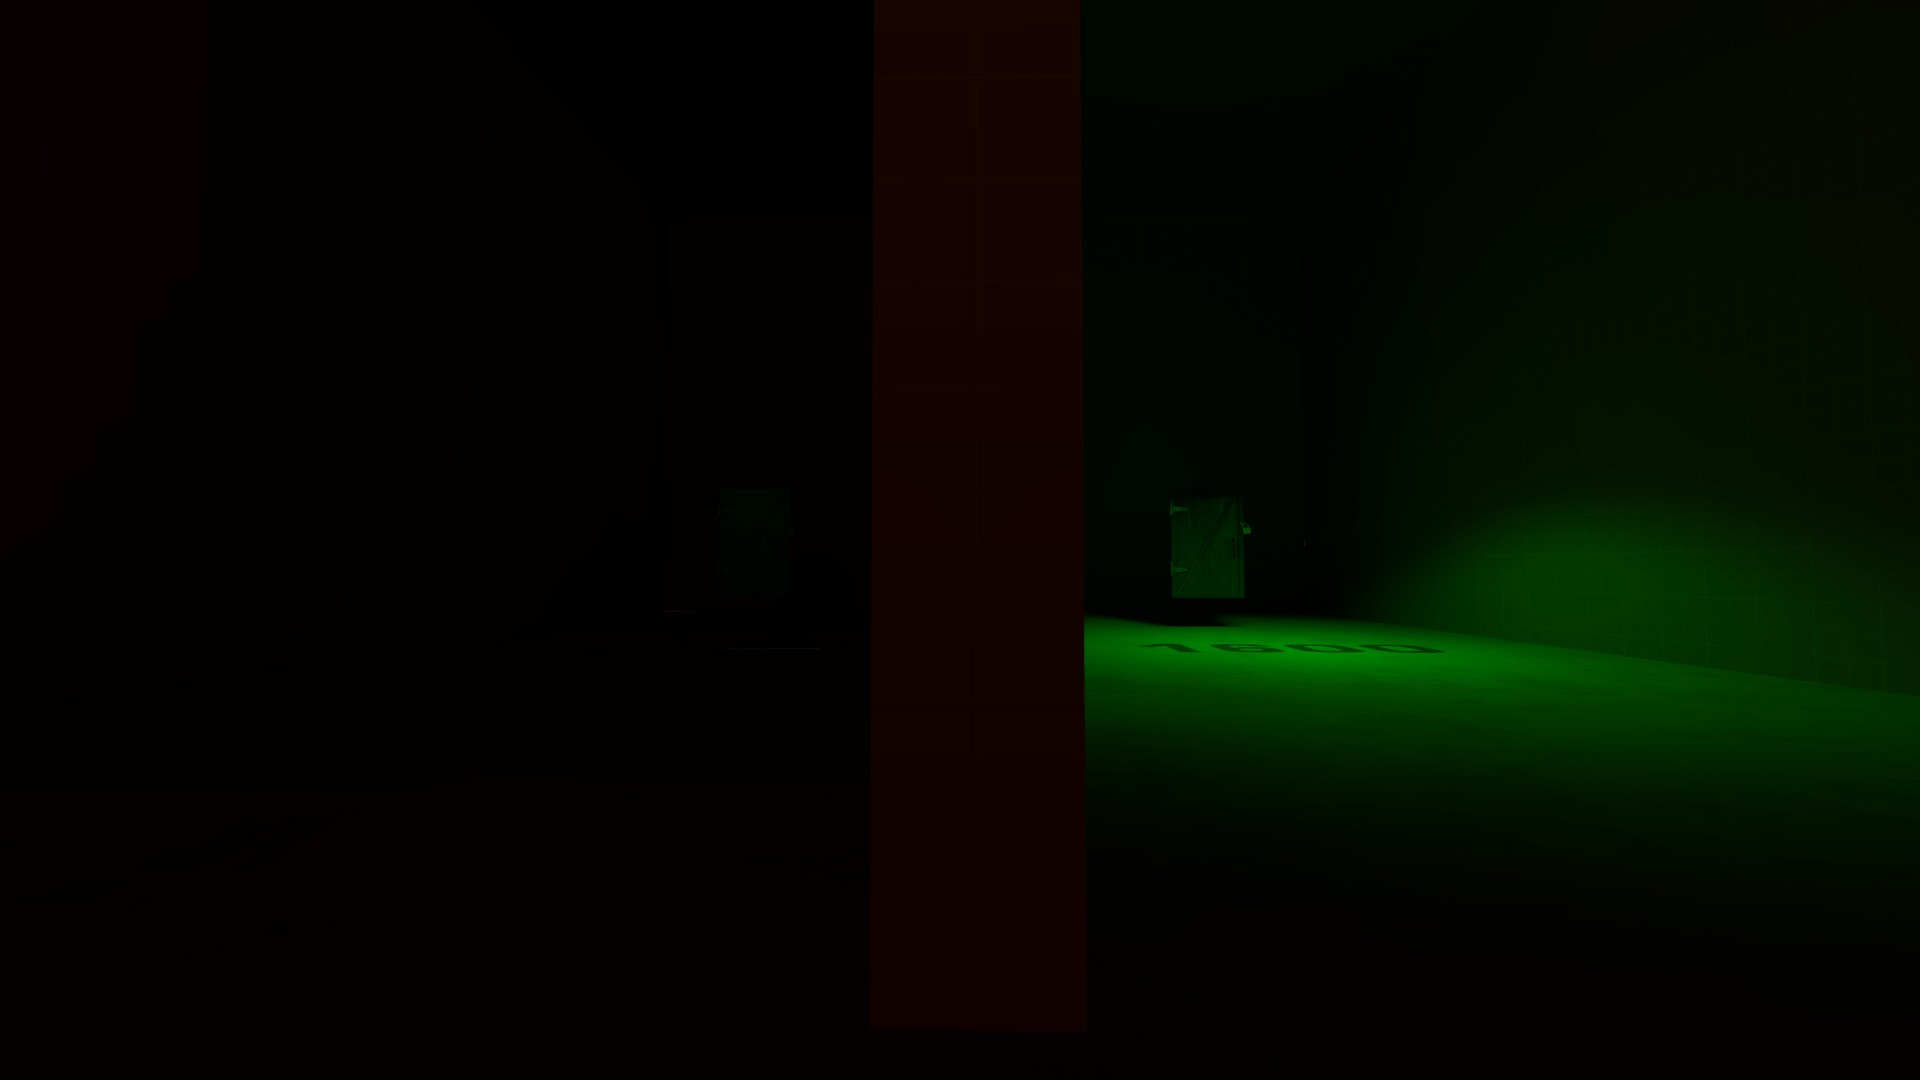 light_spot_1600.jpg